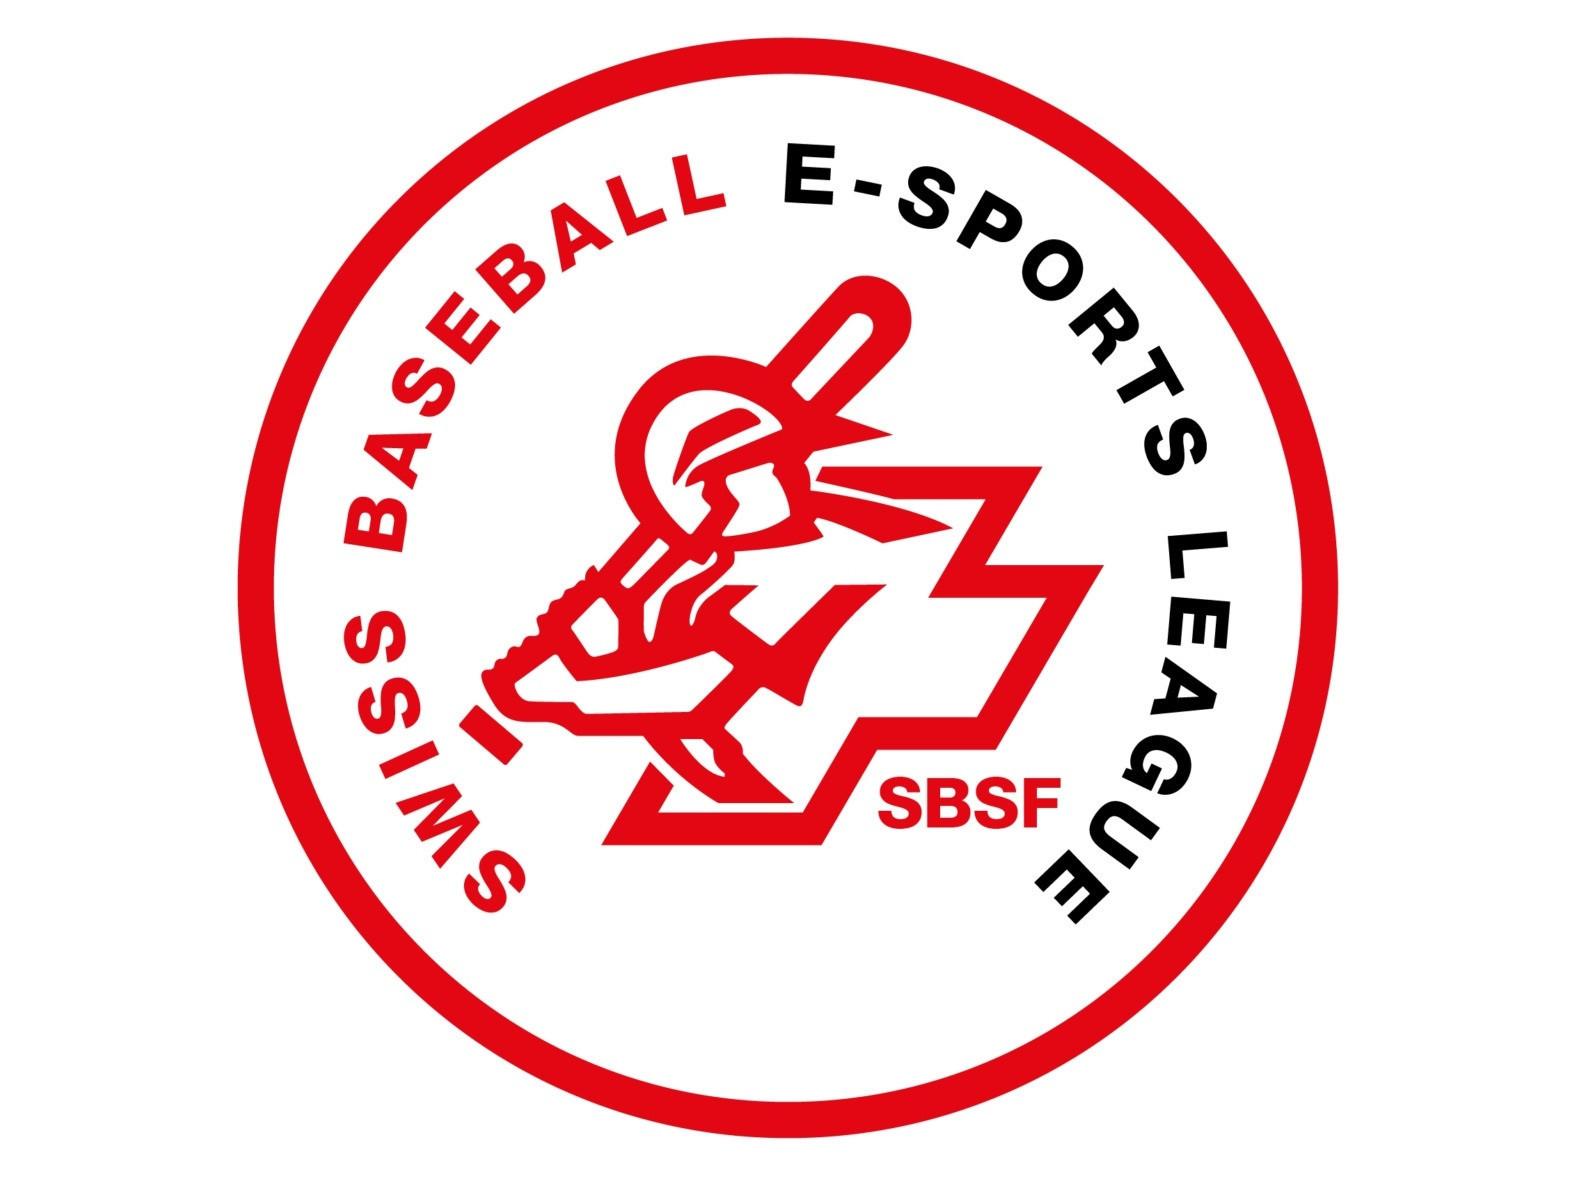 The Swiss Baseball E-Sports League is set to start on January 11 ©SBSF